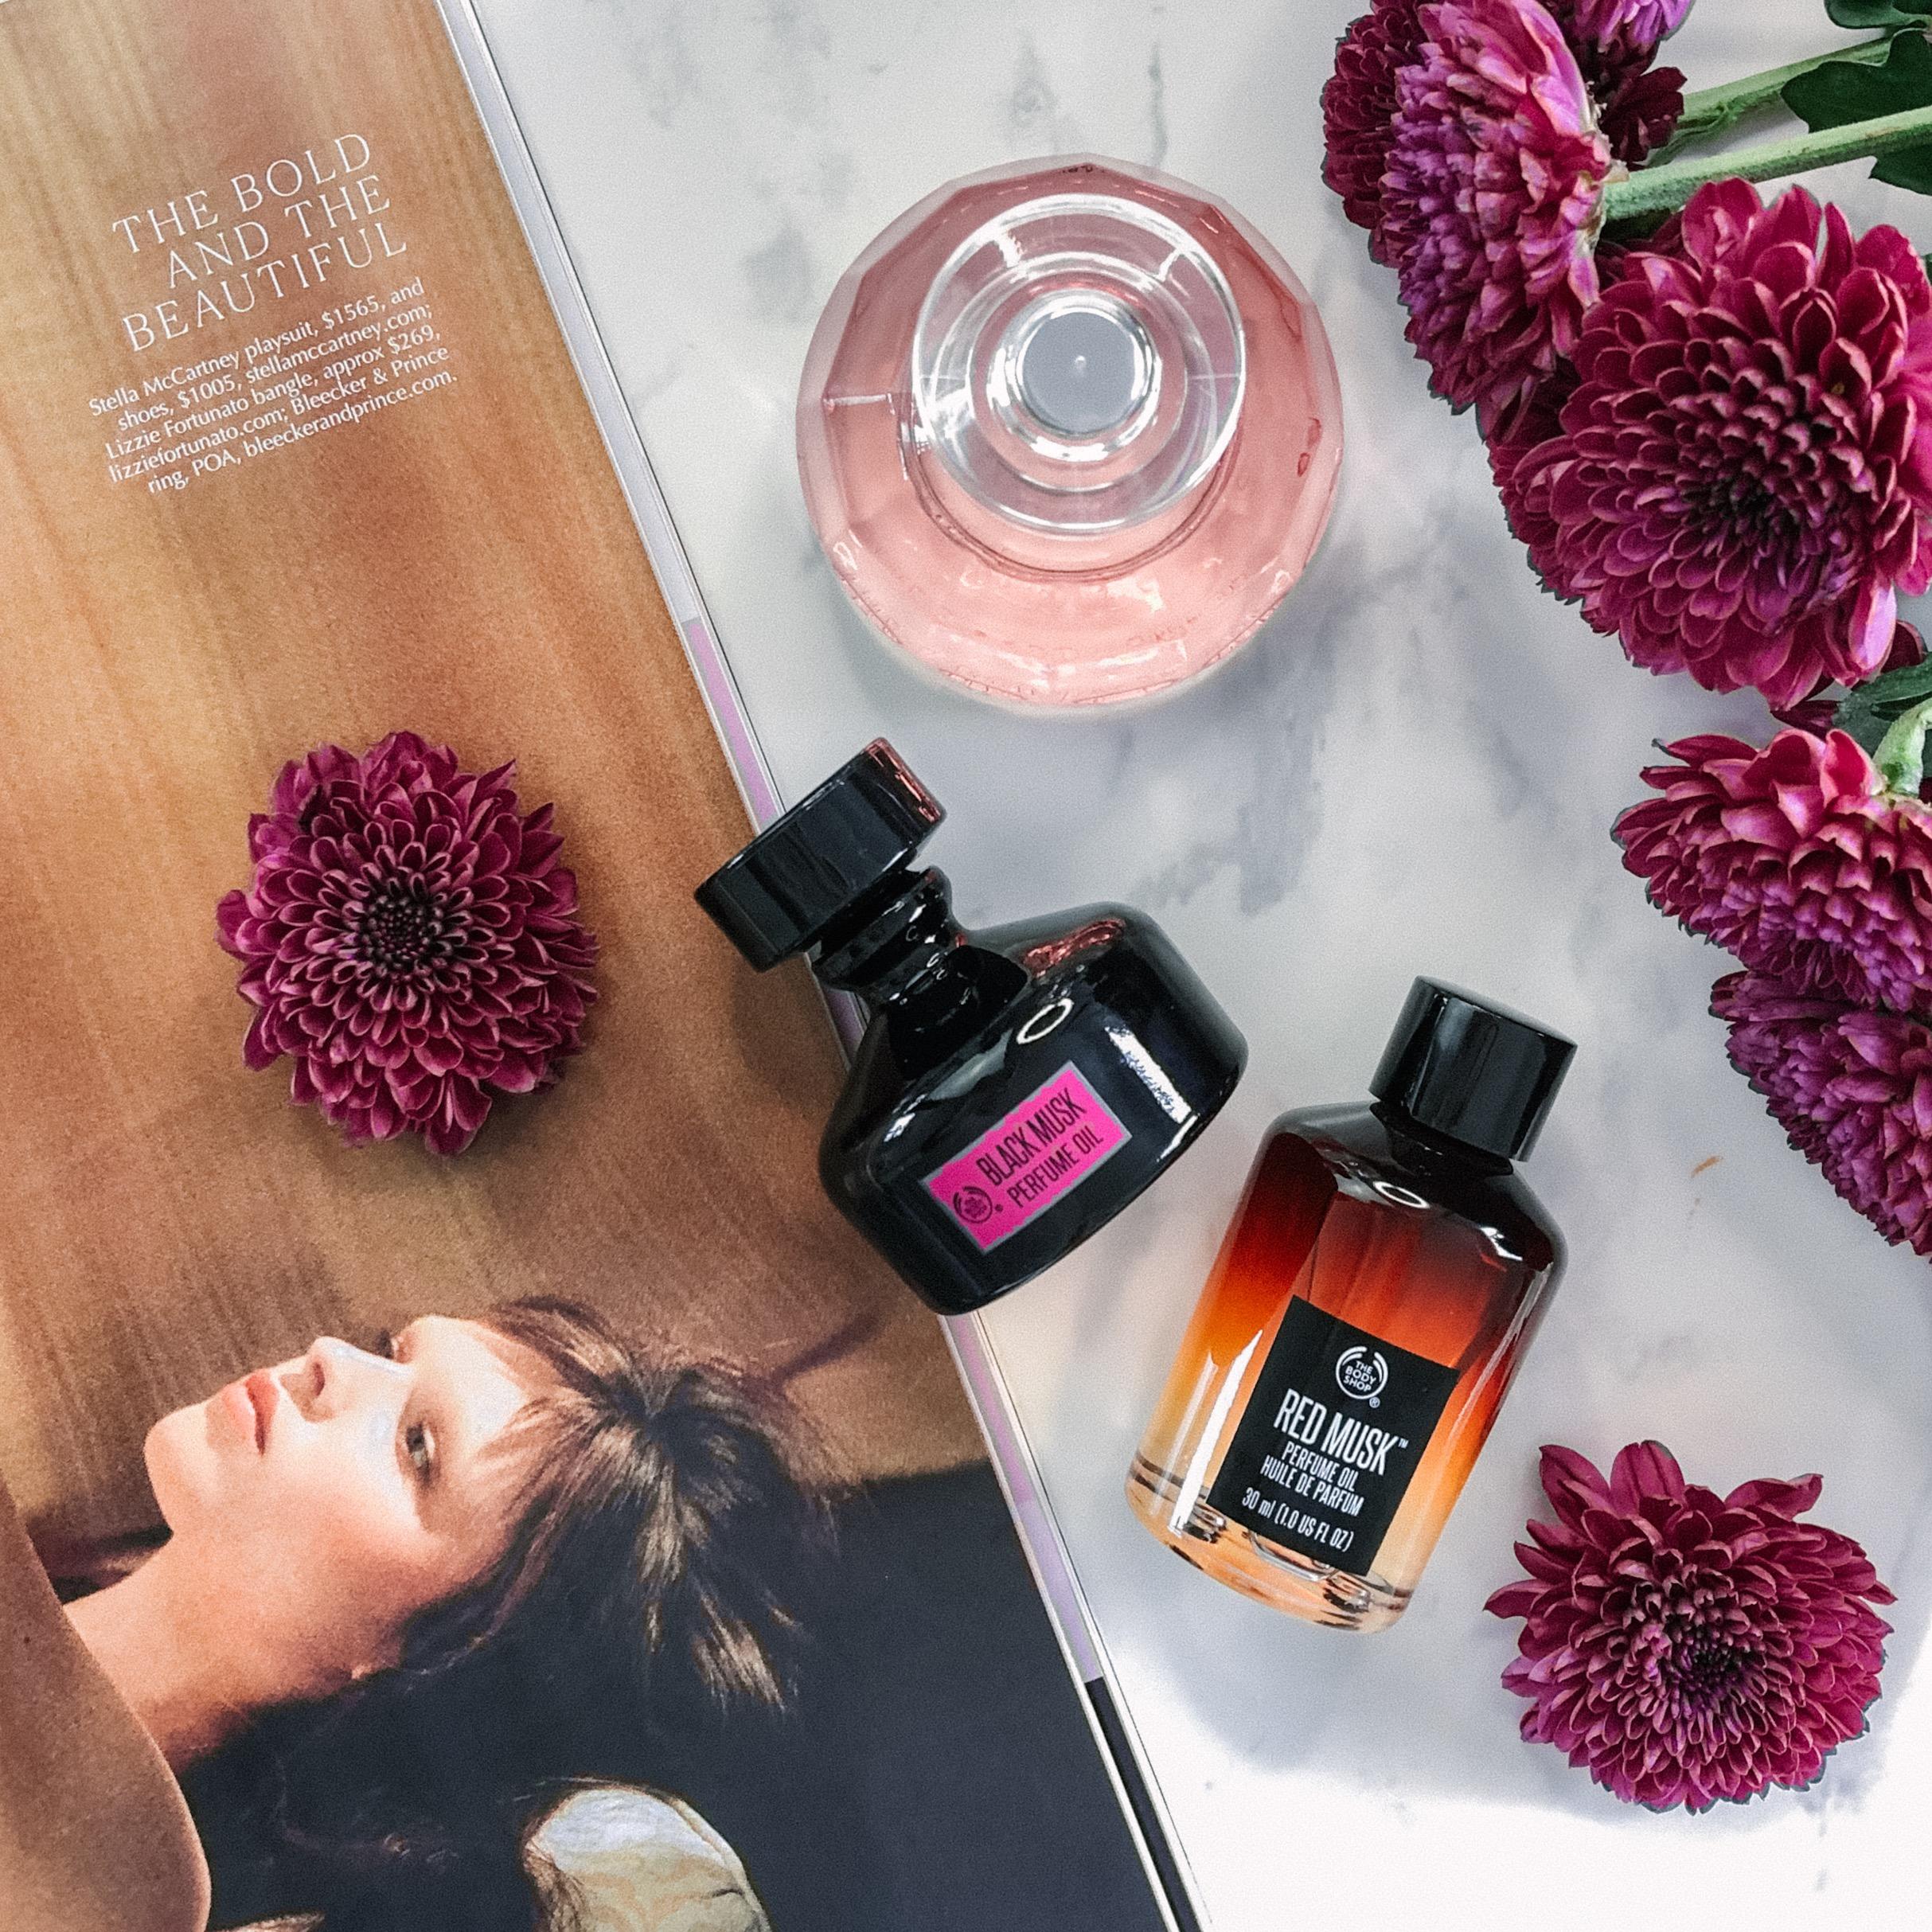 Cruelty Free Perfume Guide 2019